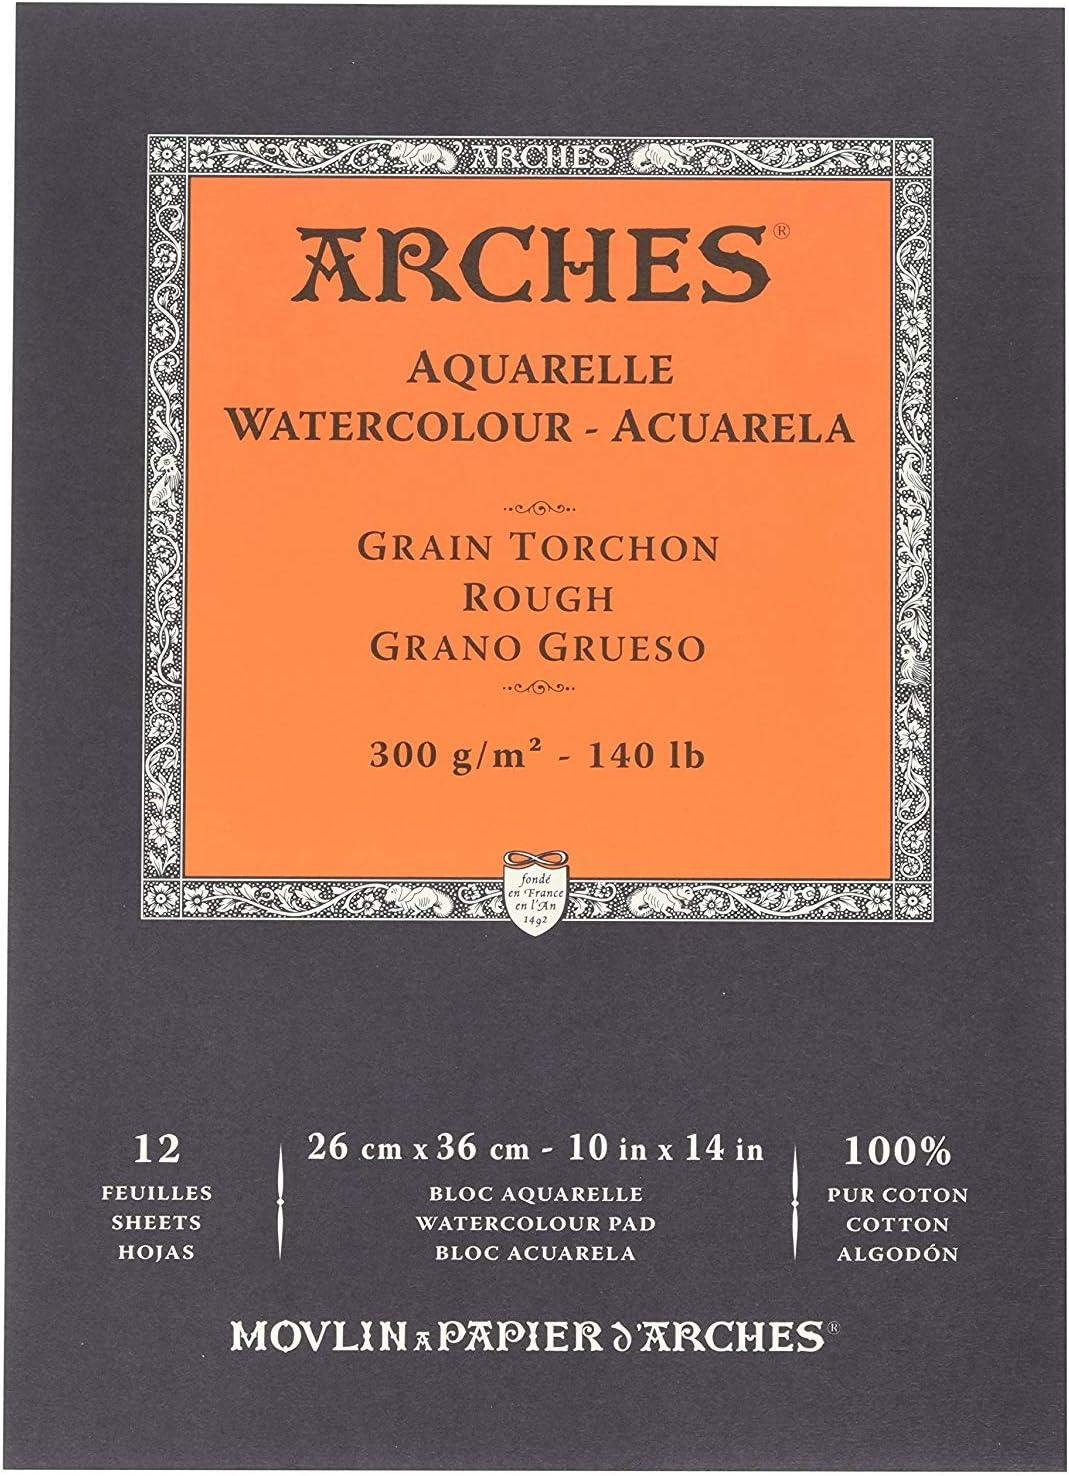 ARCHES Papel de Acuarela, 100% Algodon, Blanco, 36x26x1 cm, 12 ...